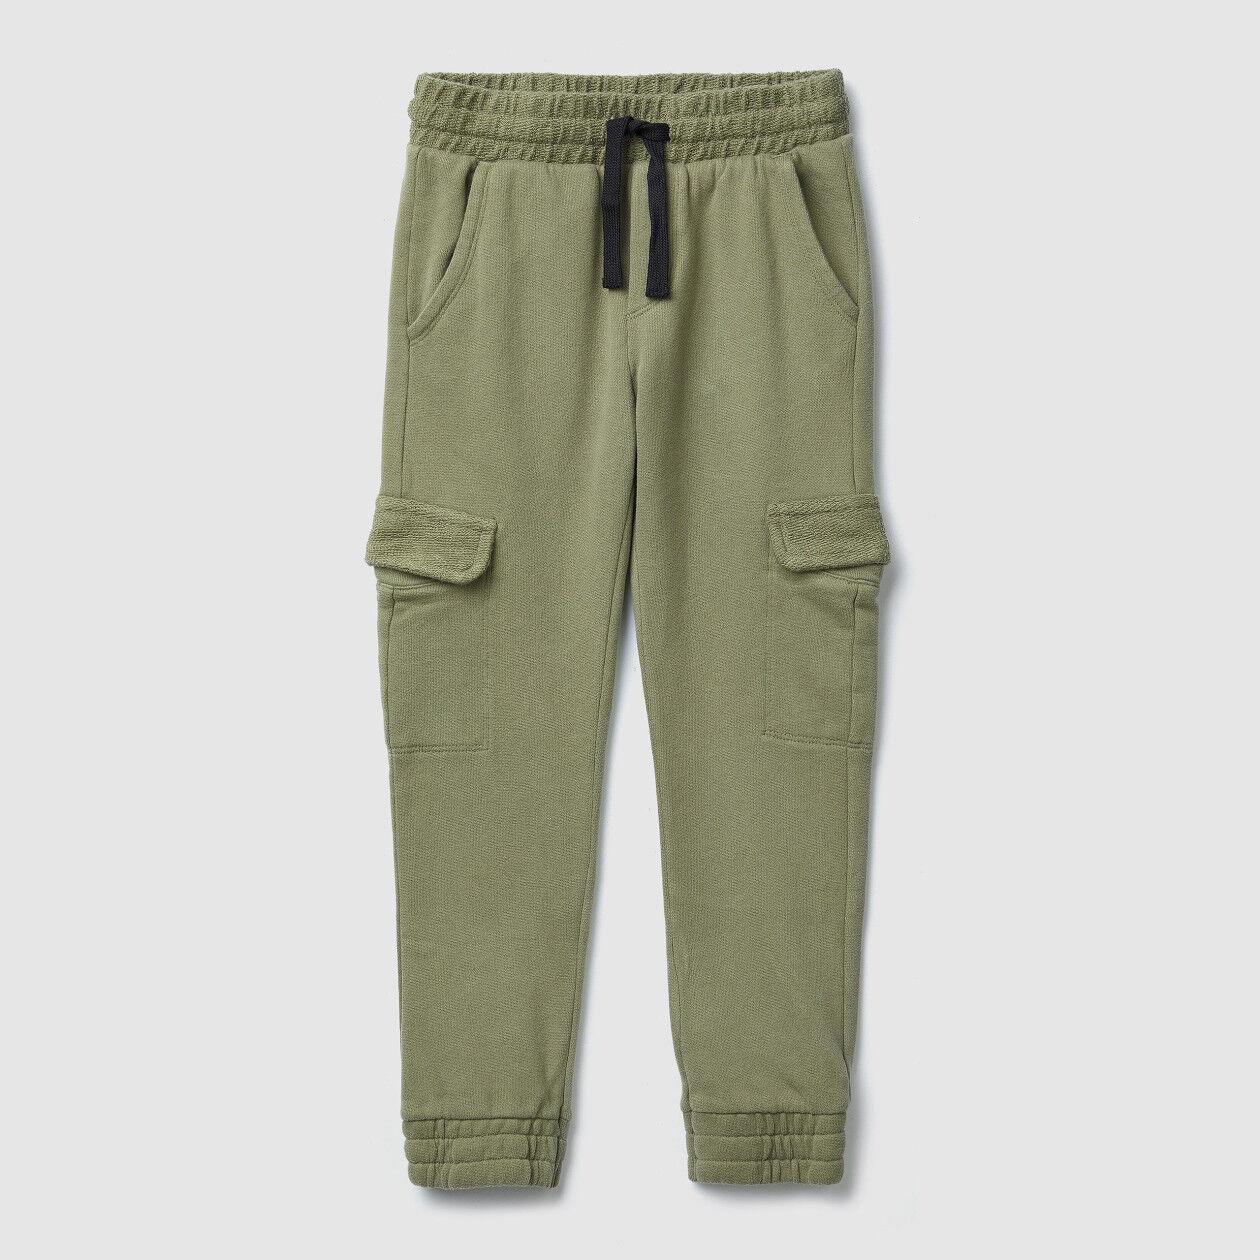 Pantaloni cargo in felpa